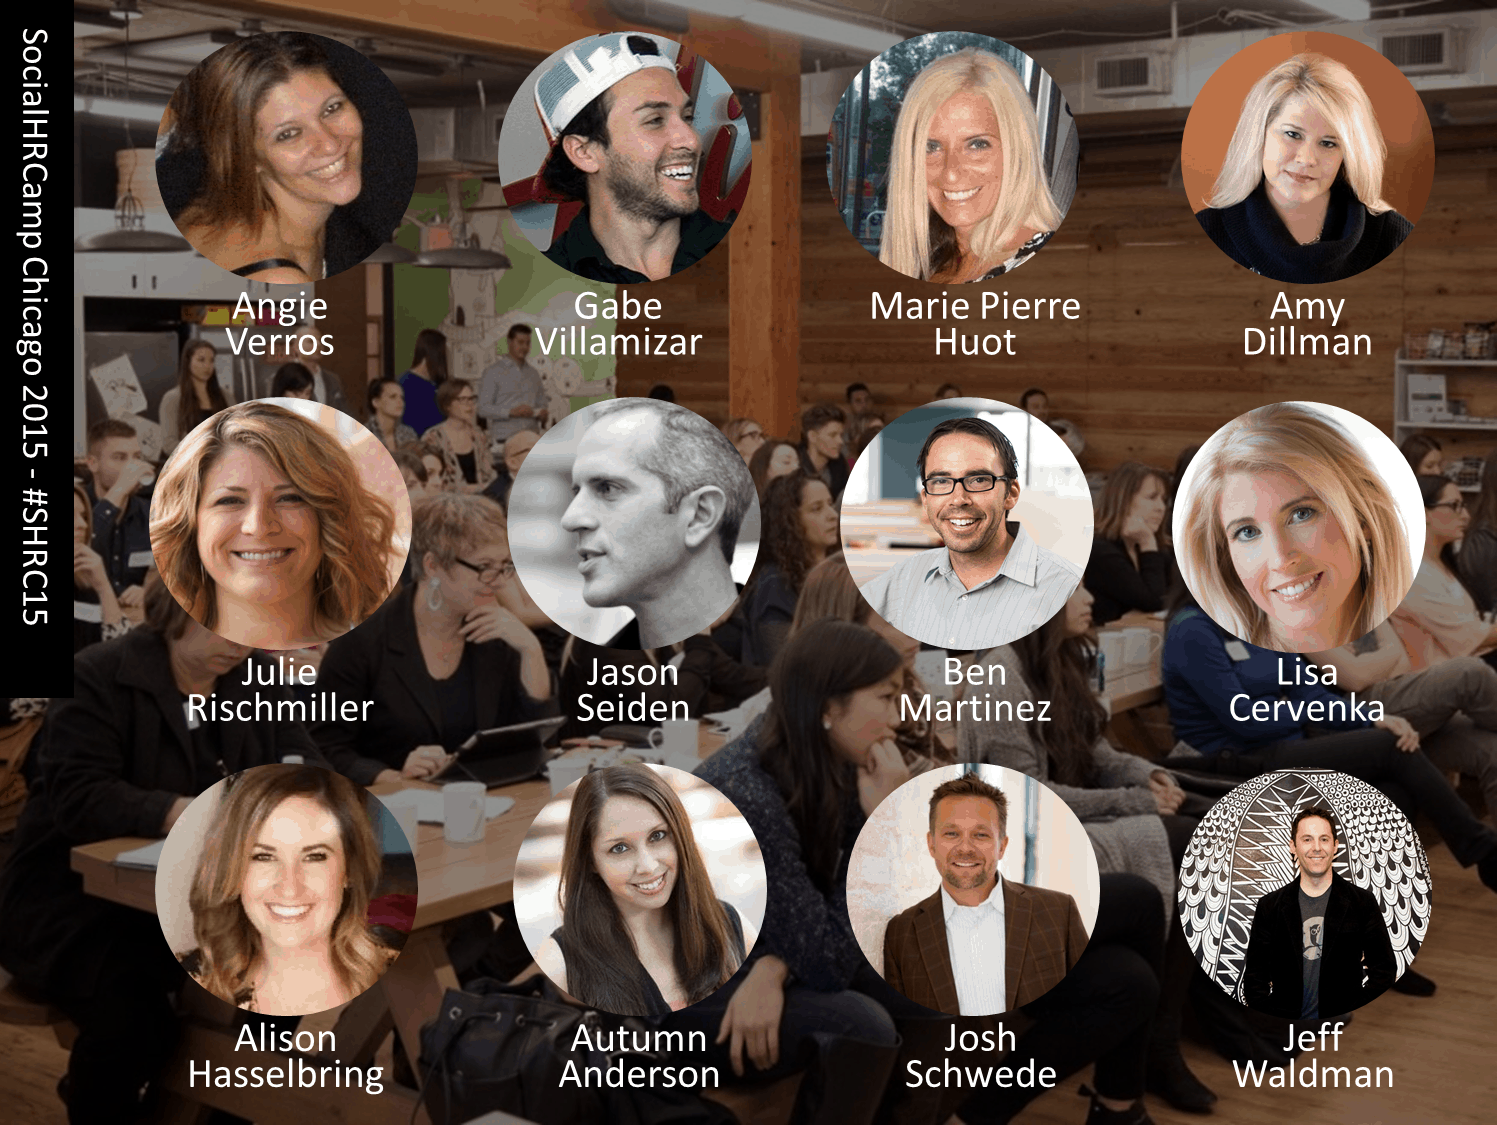 SocialHRCamp Chicago 2015 Speakers #SHRC15